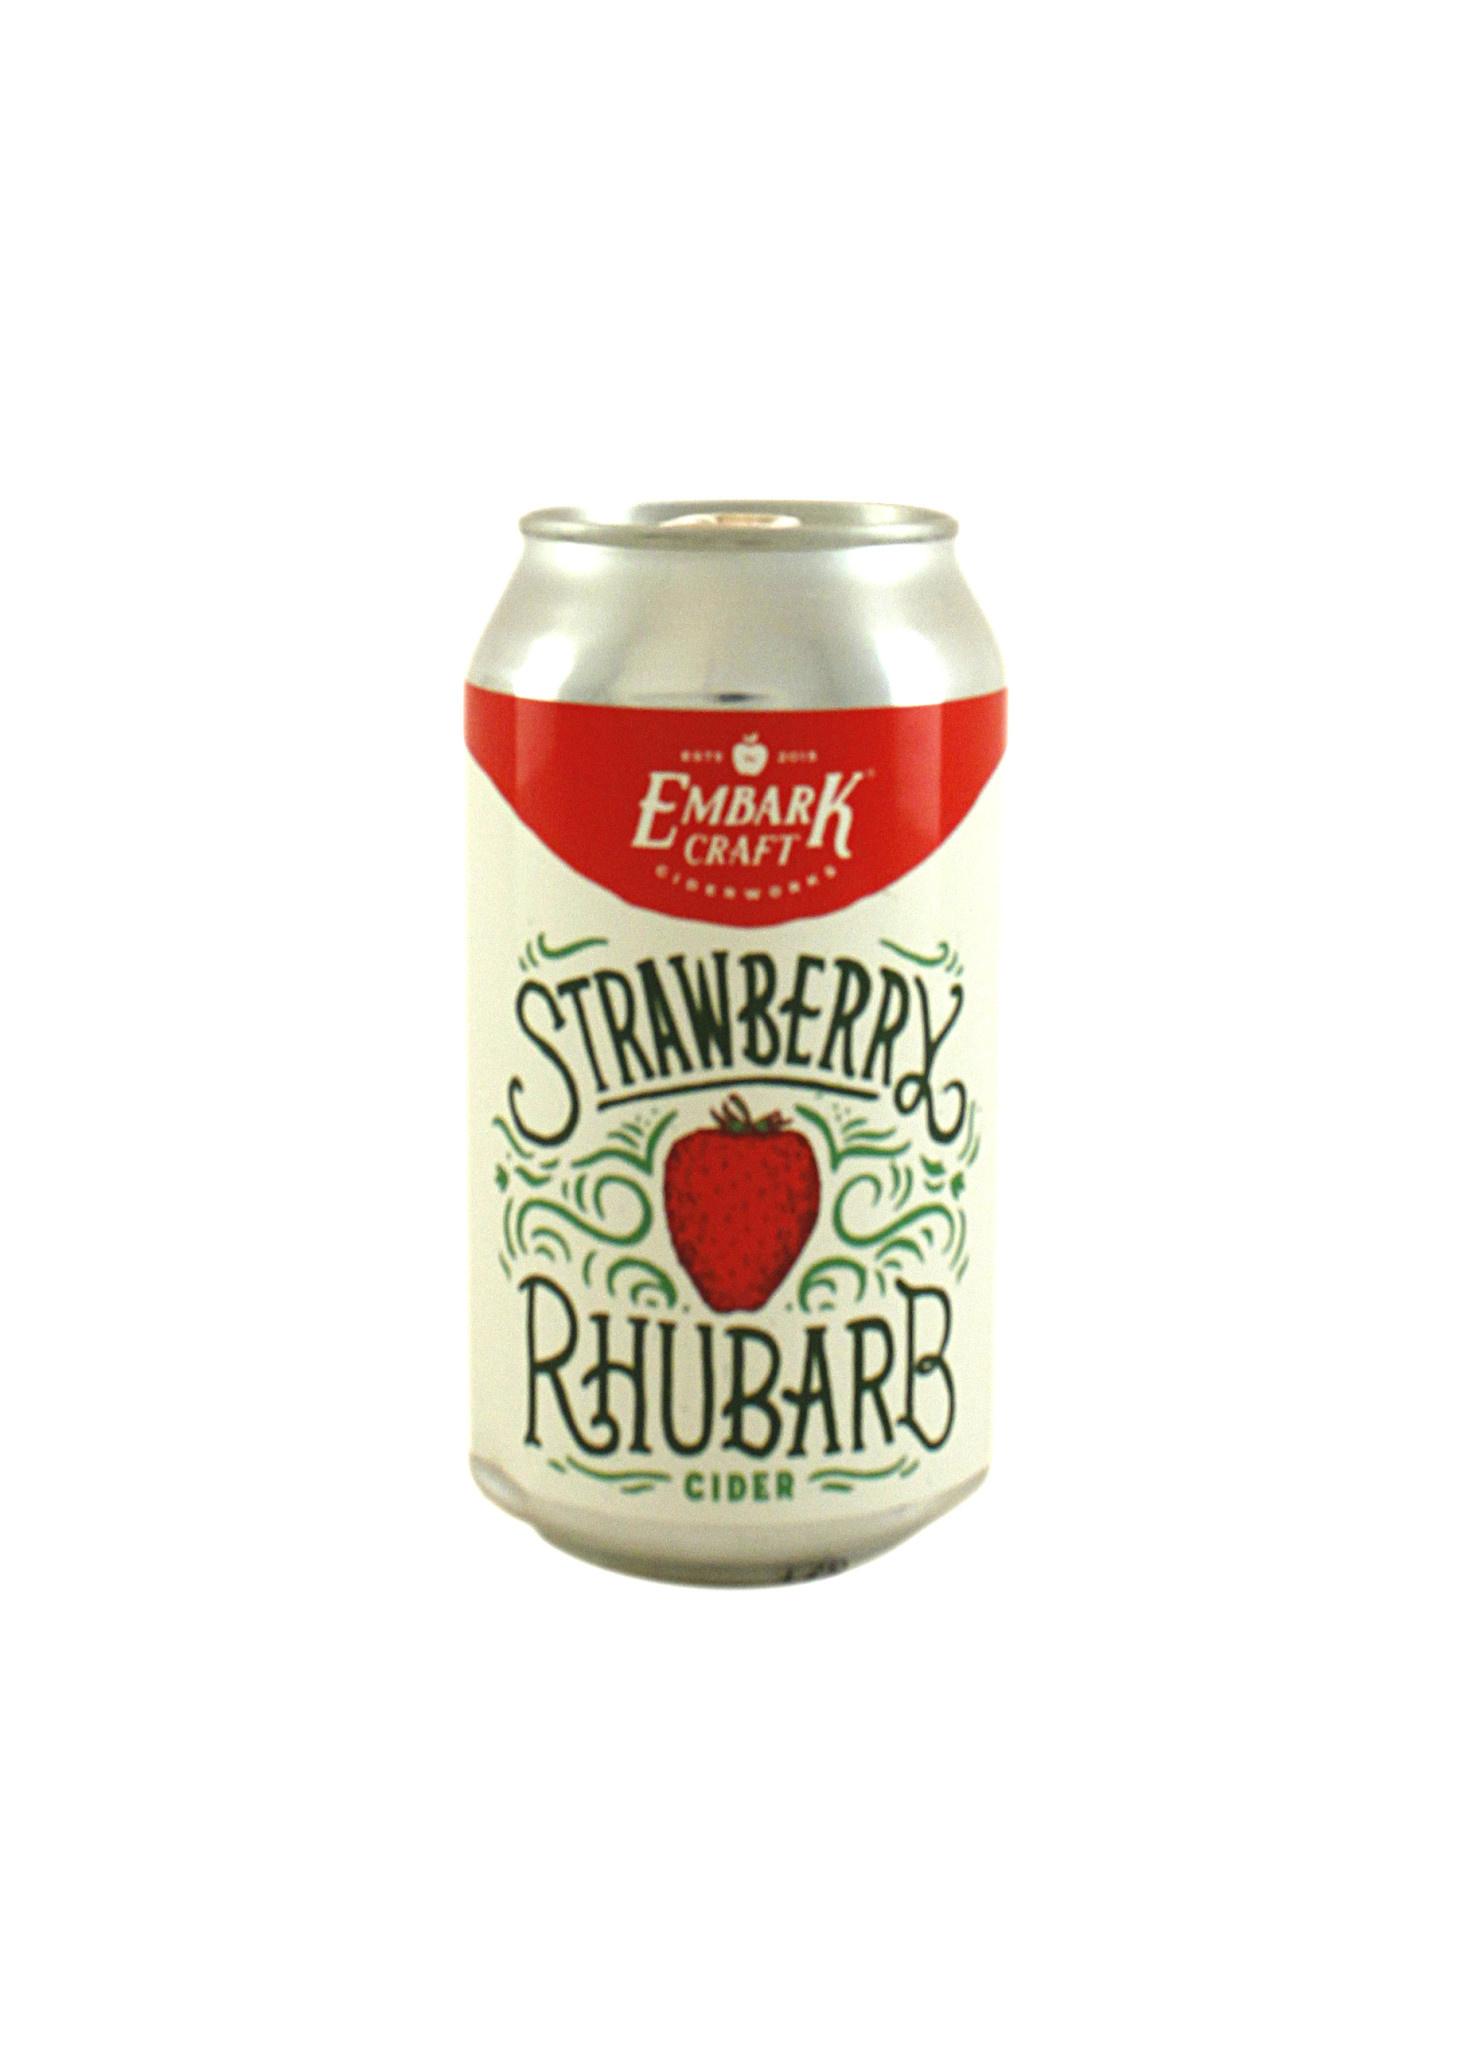 "Embark Craft Cider ""Strawberry Rhubarb"" Hard Cider 12oz. can - Williamson, NY"